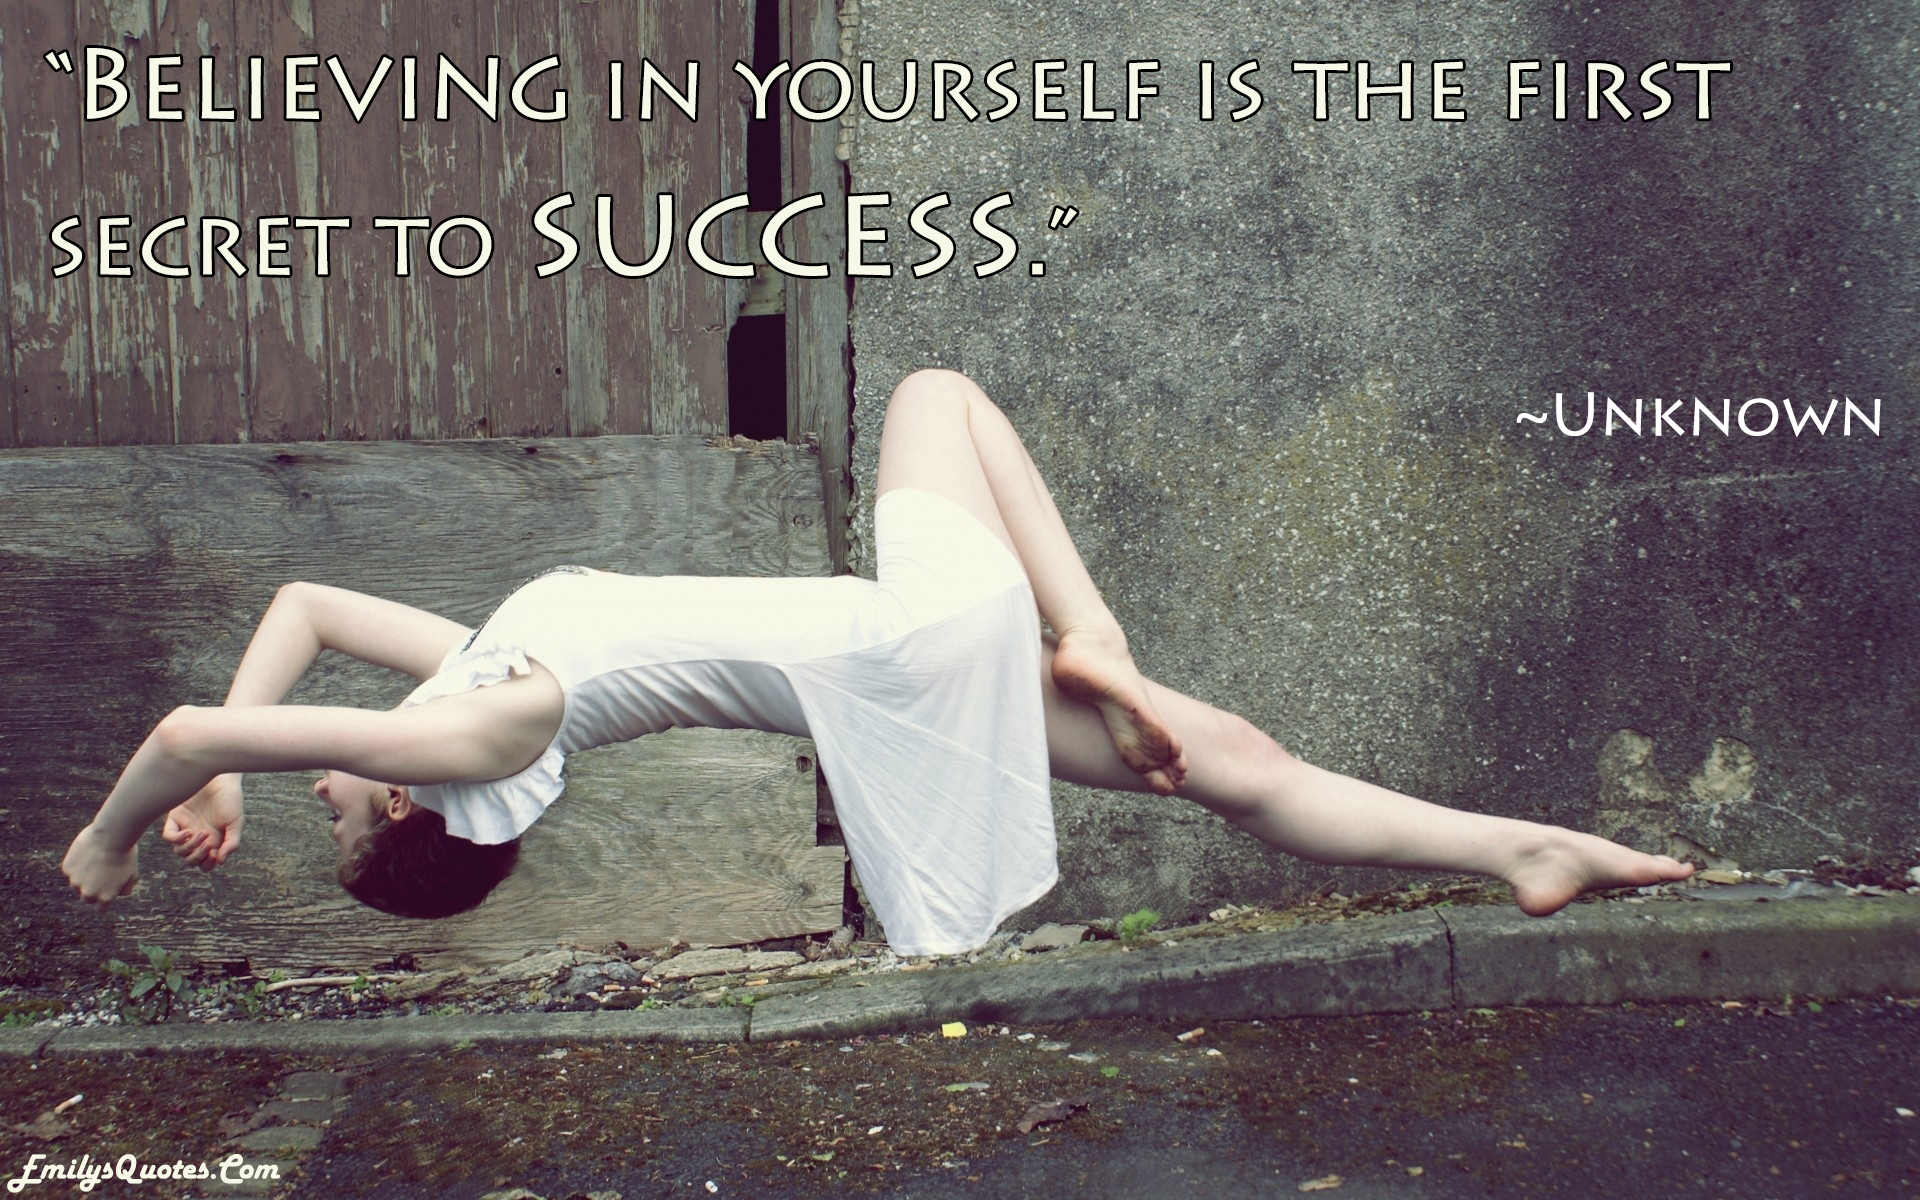 EmilysQuotes.Com - Motivational, Inspirational, success, amazing, great, believing, unknown